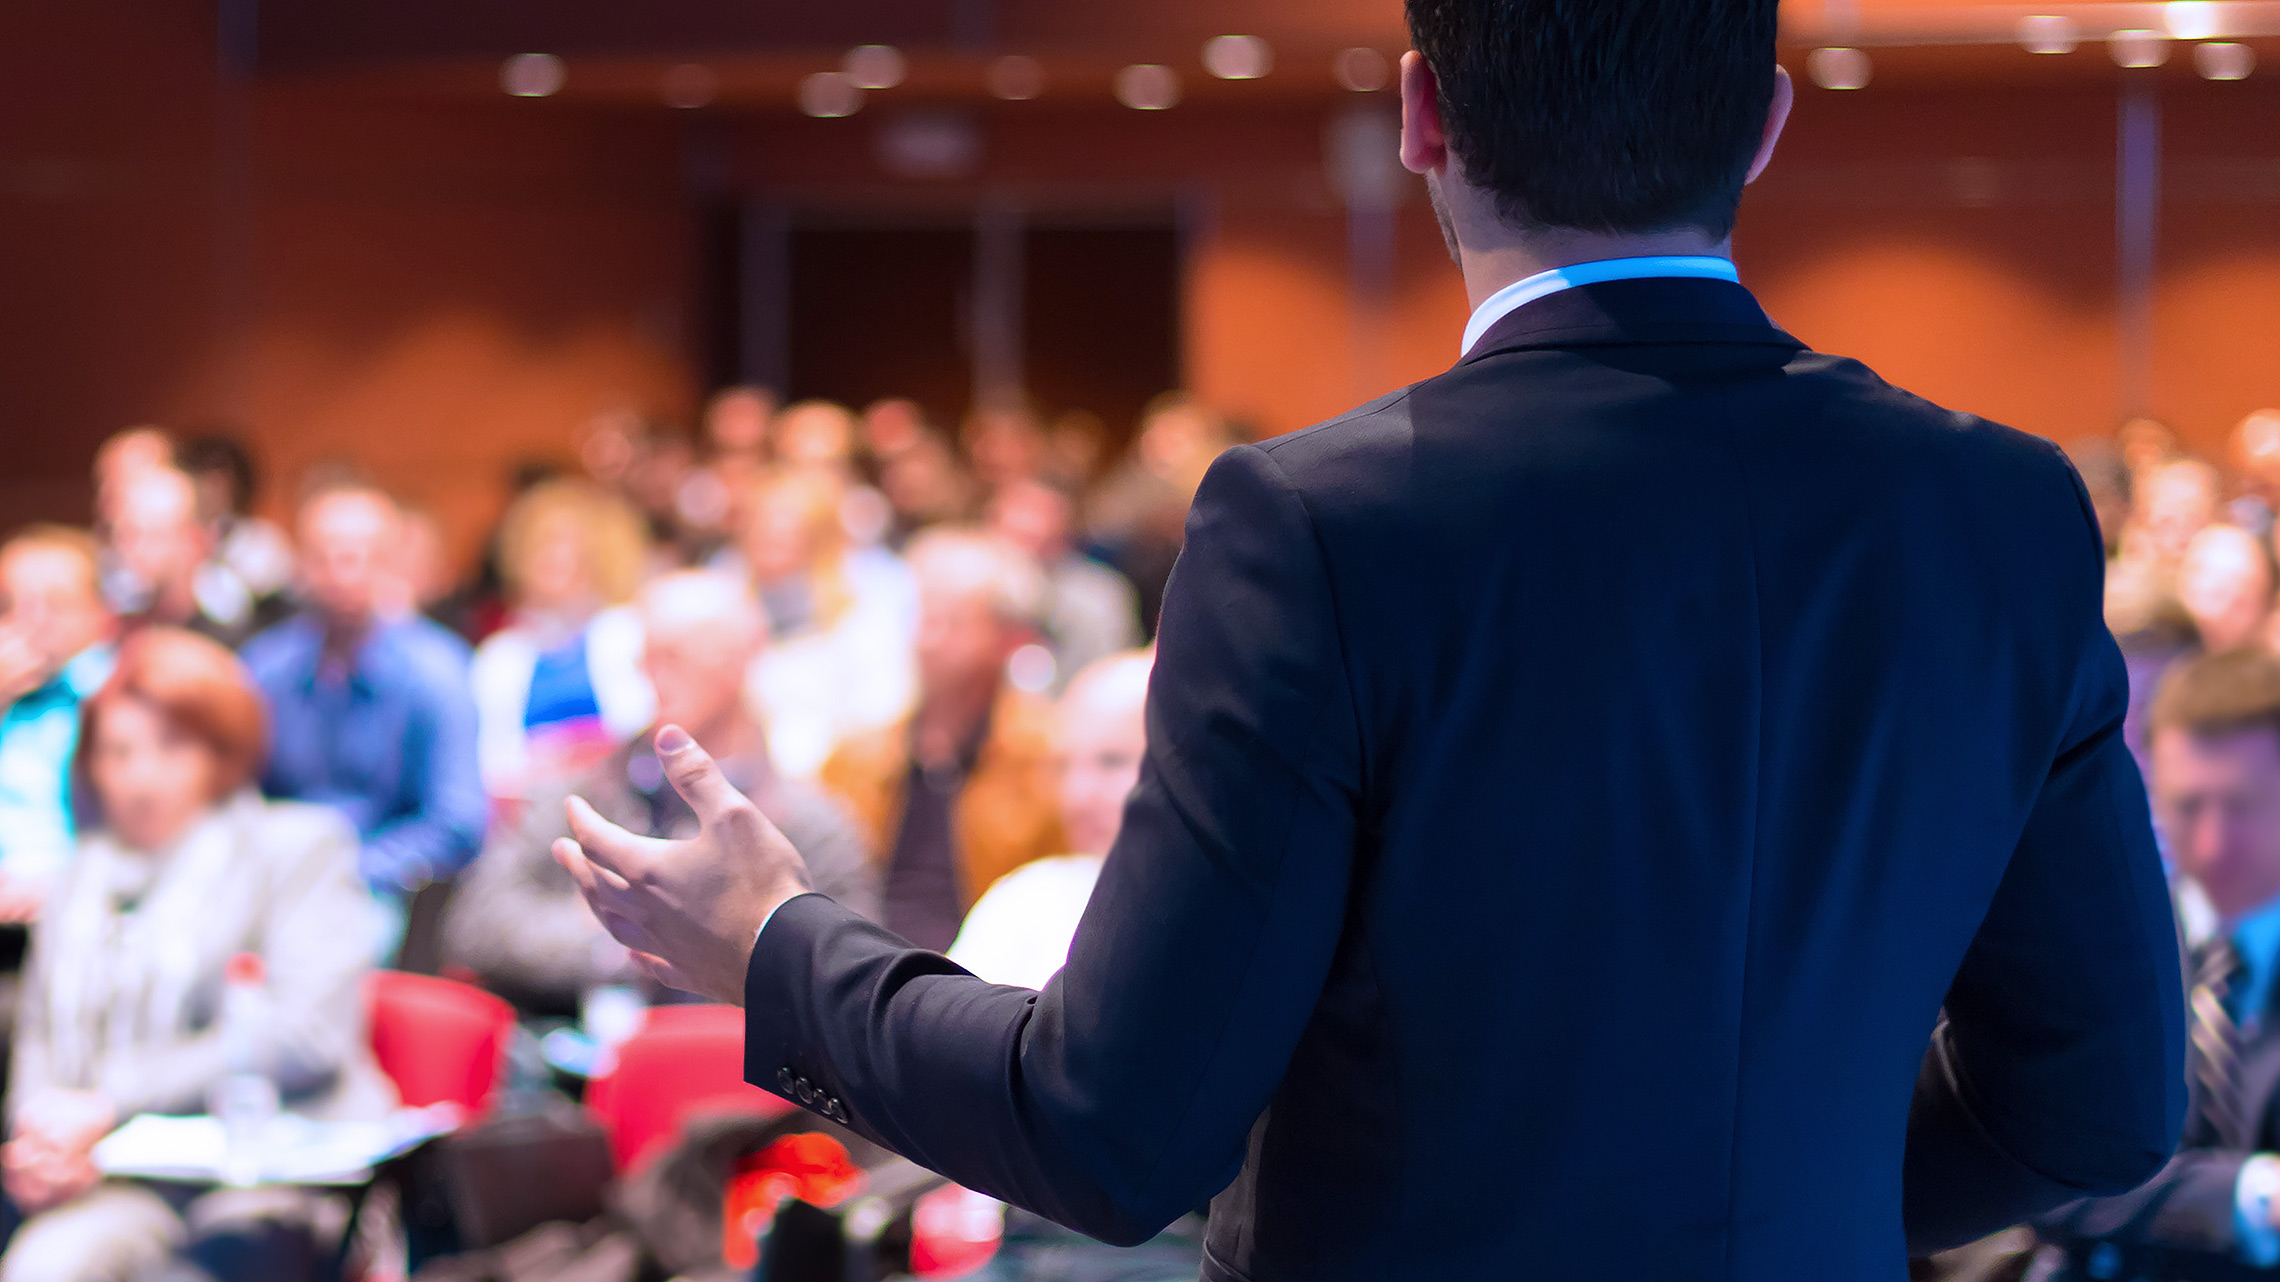 5th edition of Lean Six Sigma Seminar Series